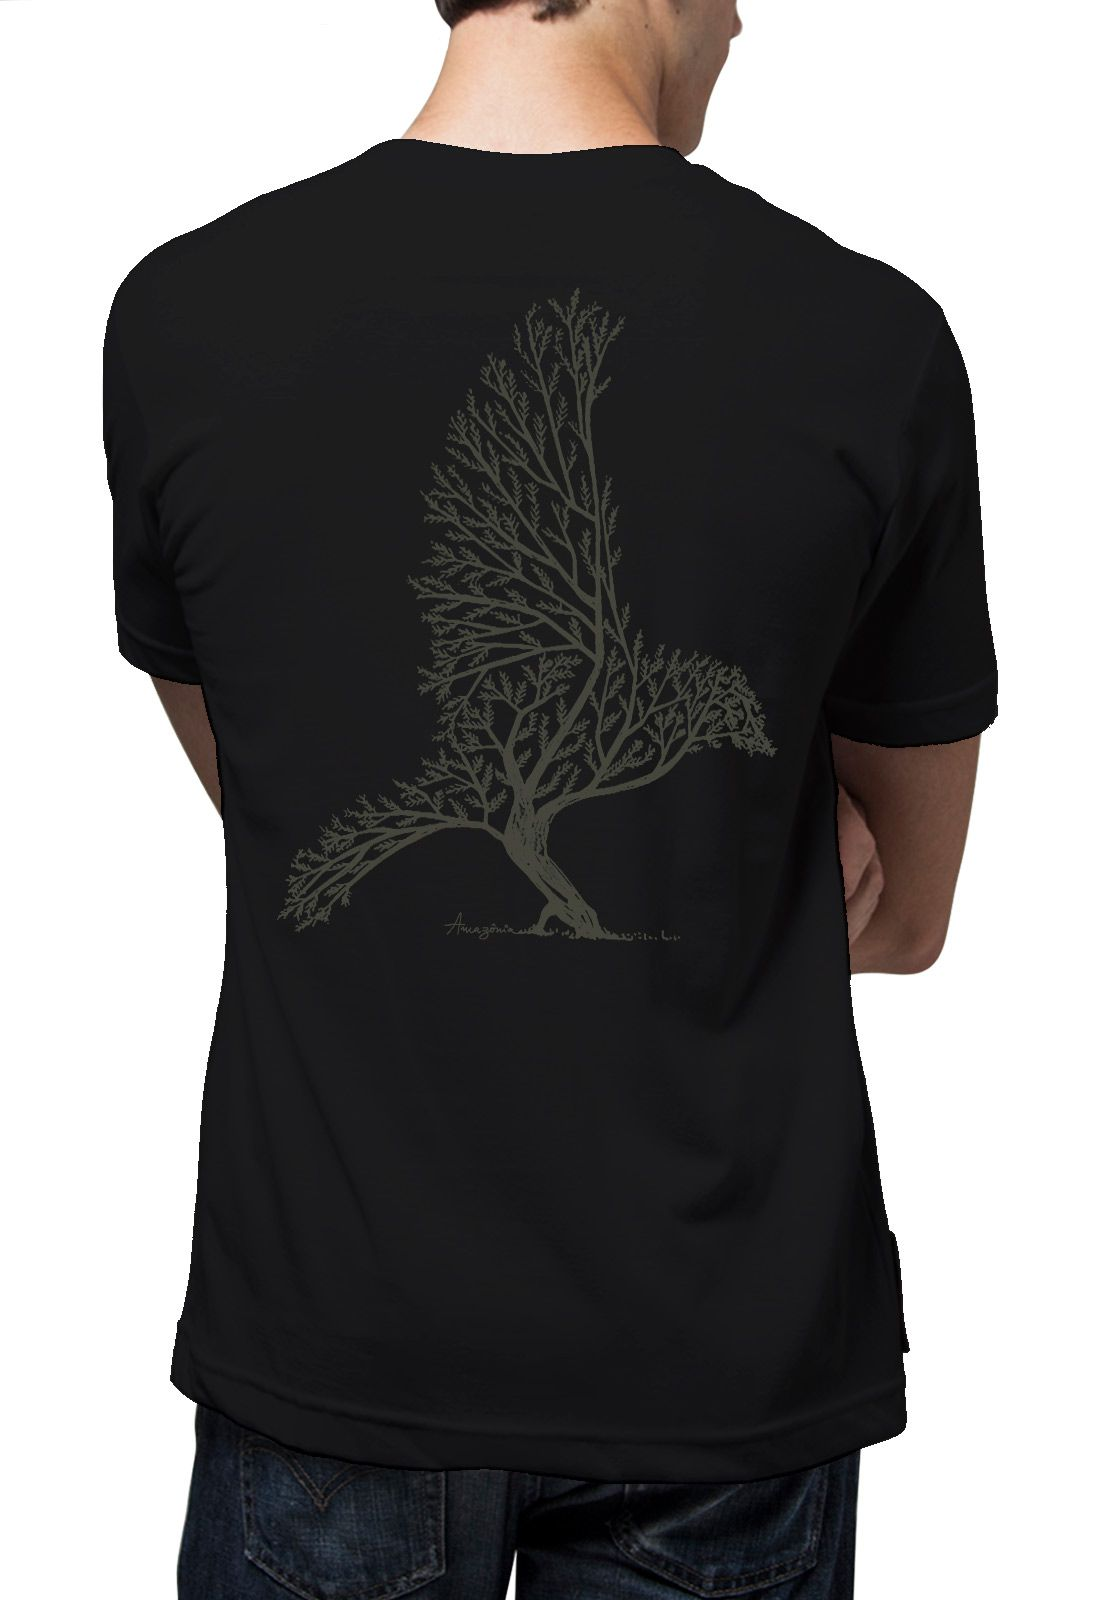 Camiseta Amazônia Bird Tree - Preto